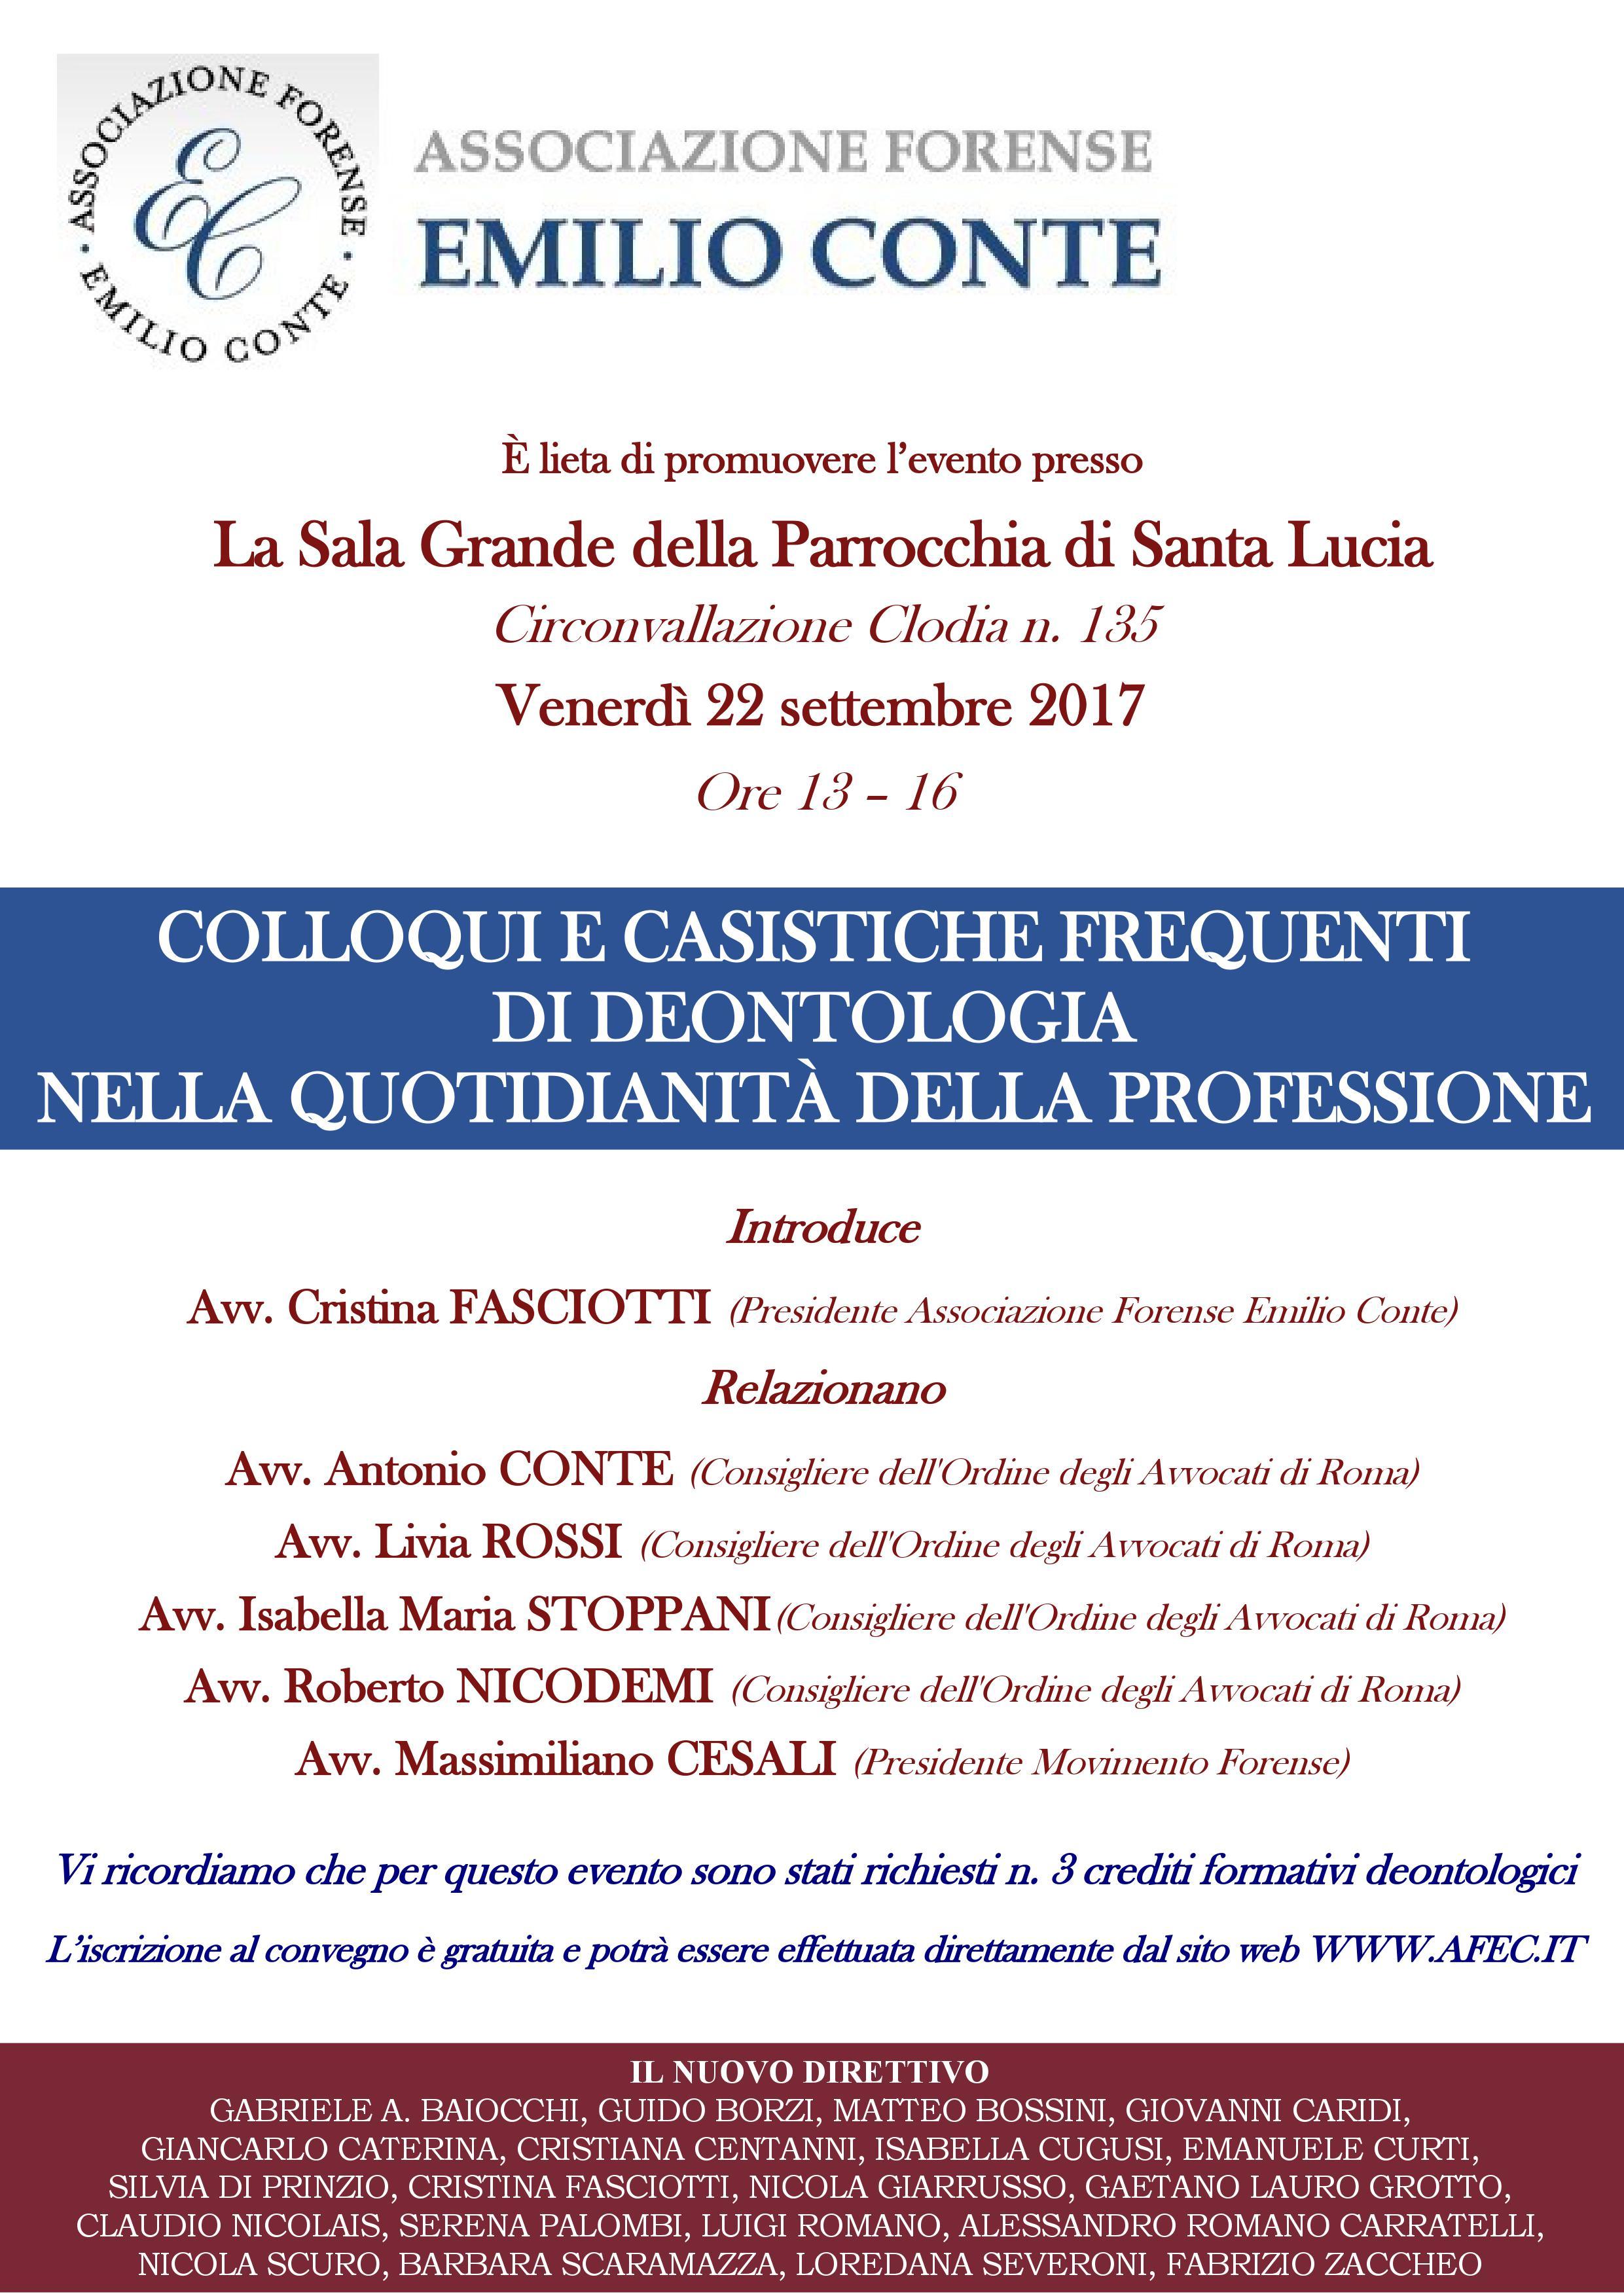 convegno deontologia 22-9-2017